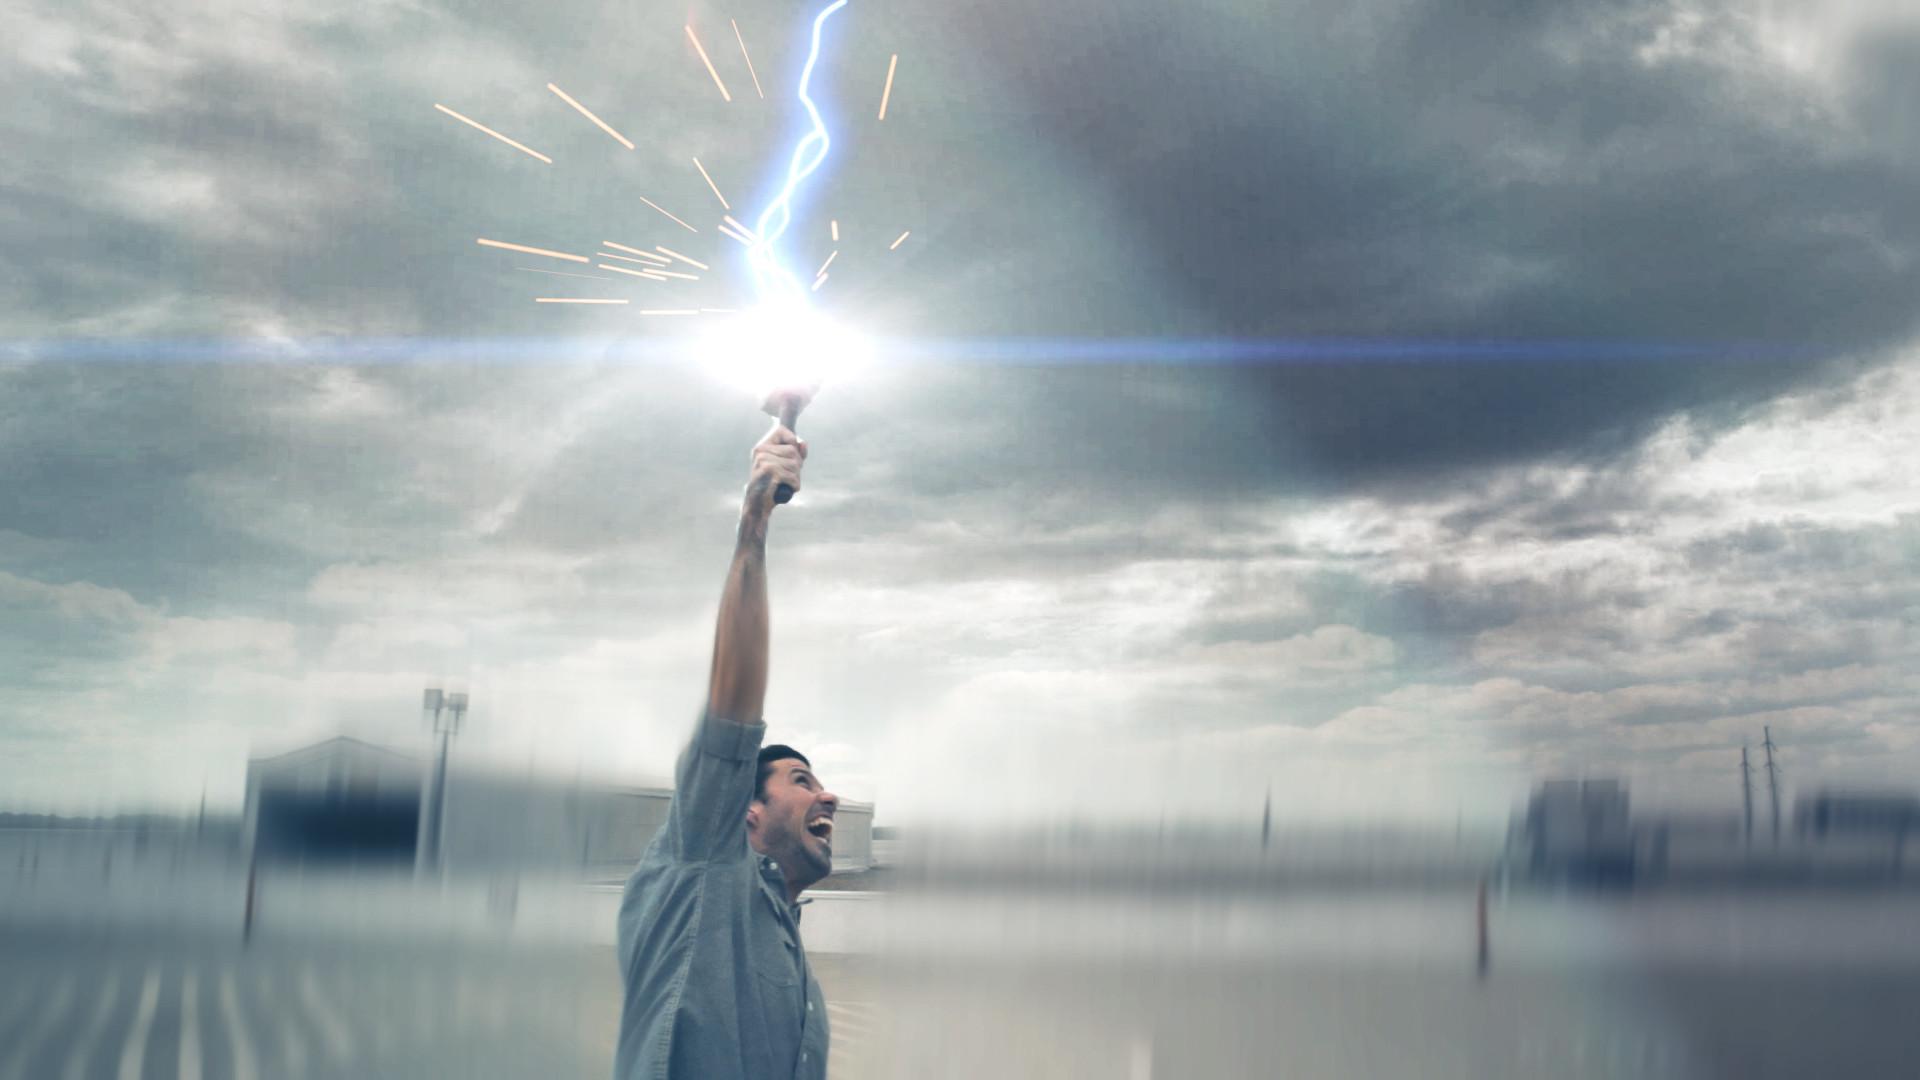 QuickTip #110: Thor's Hammer Lightning Effect